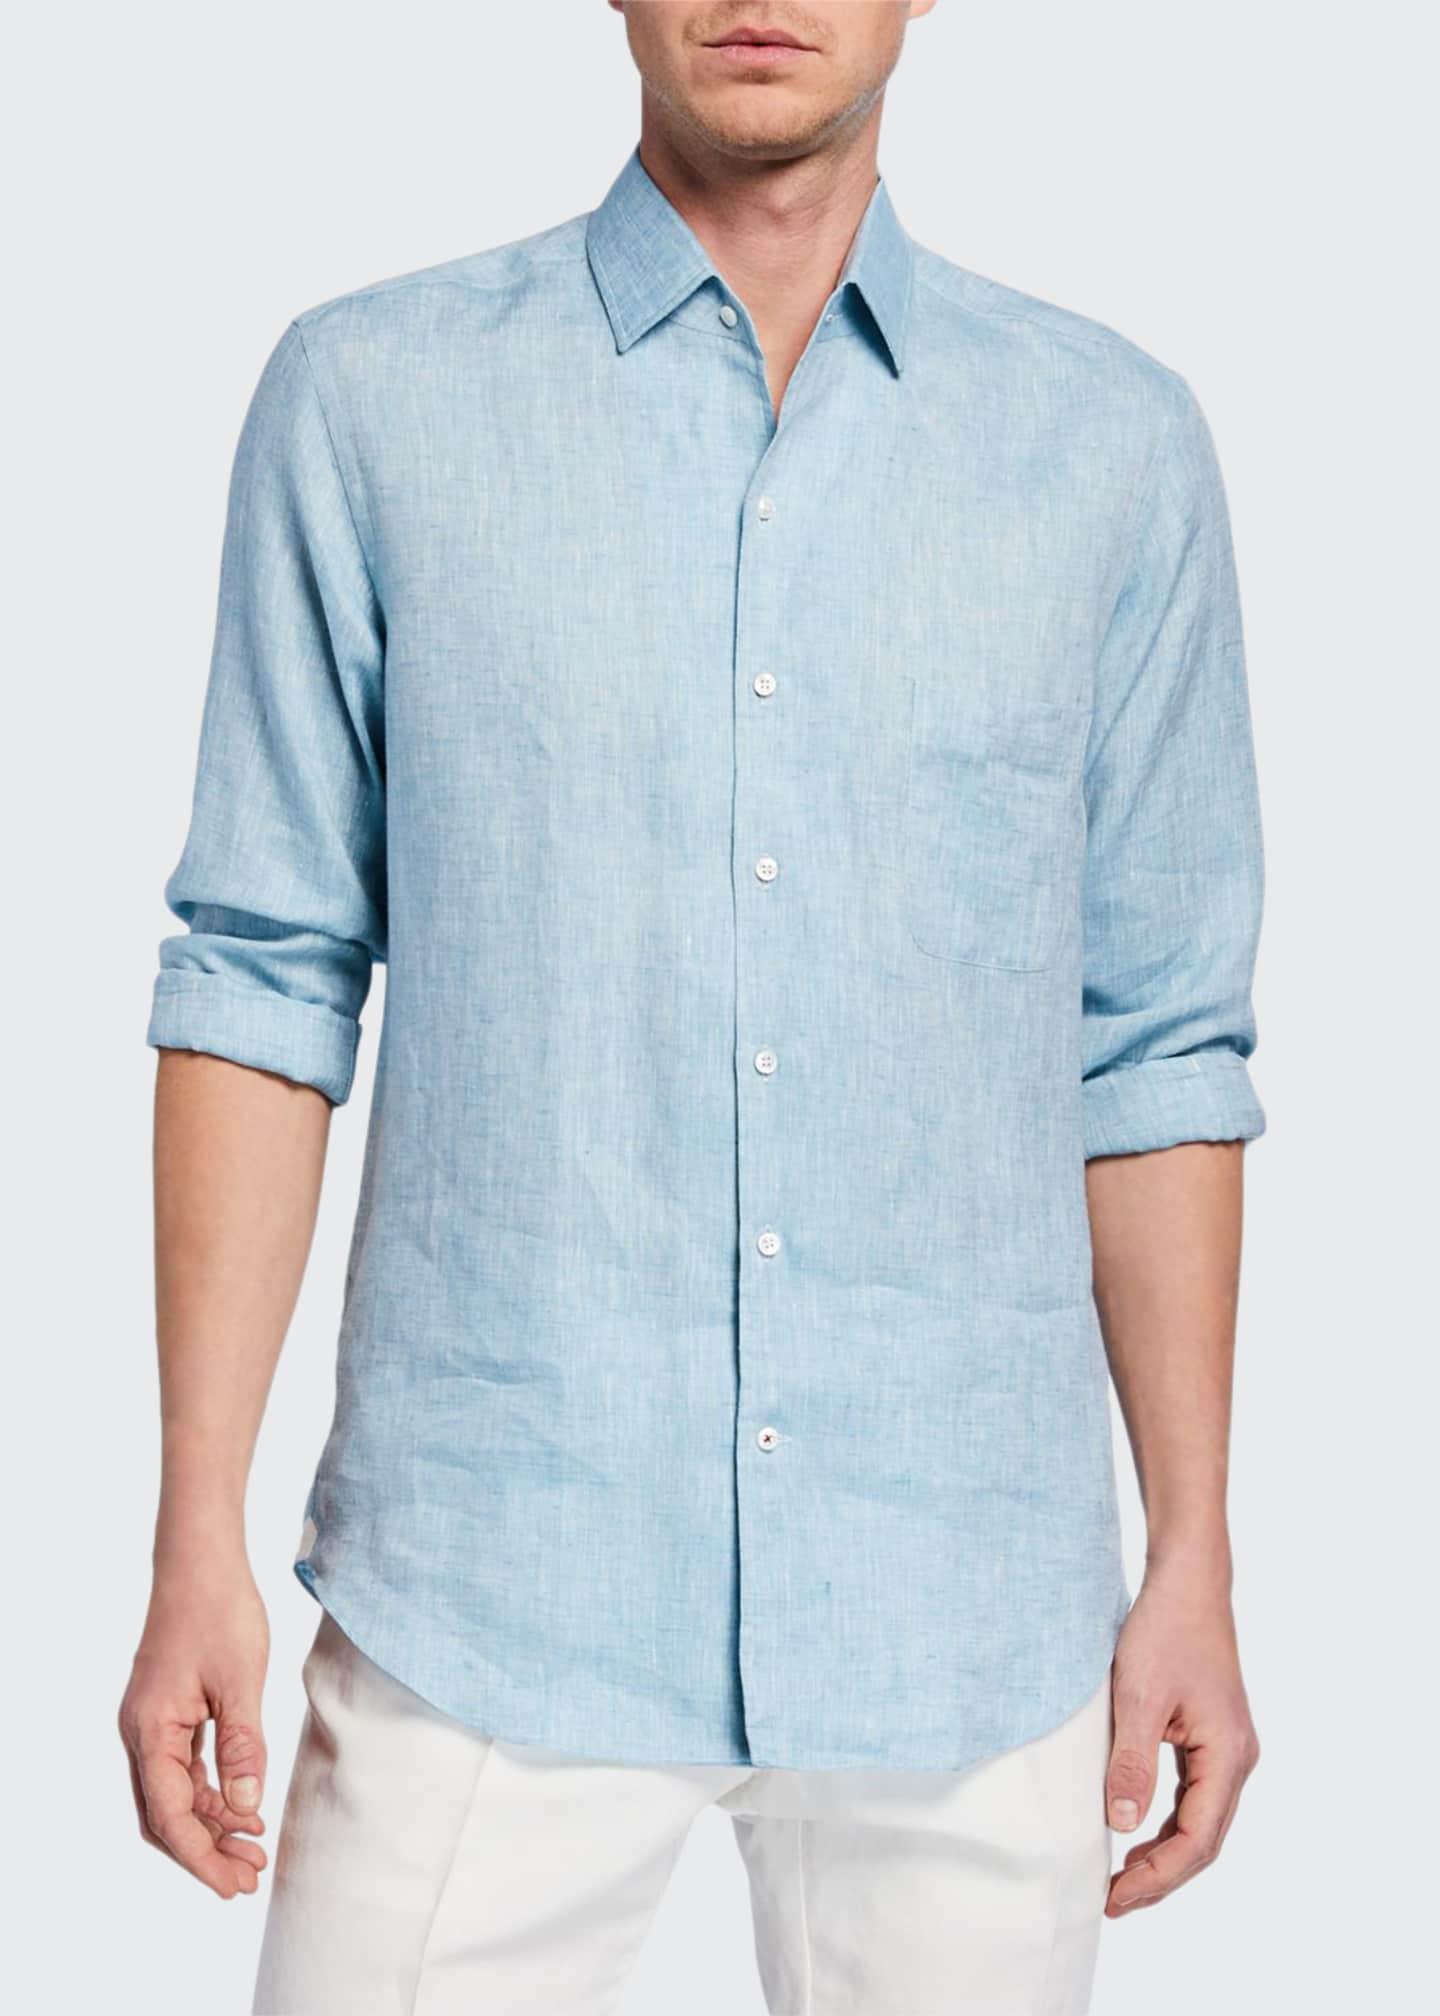 Loro Piana Men's Andrew Long-Sleeve Linen Shirt